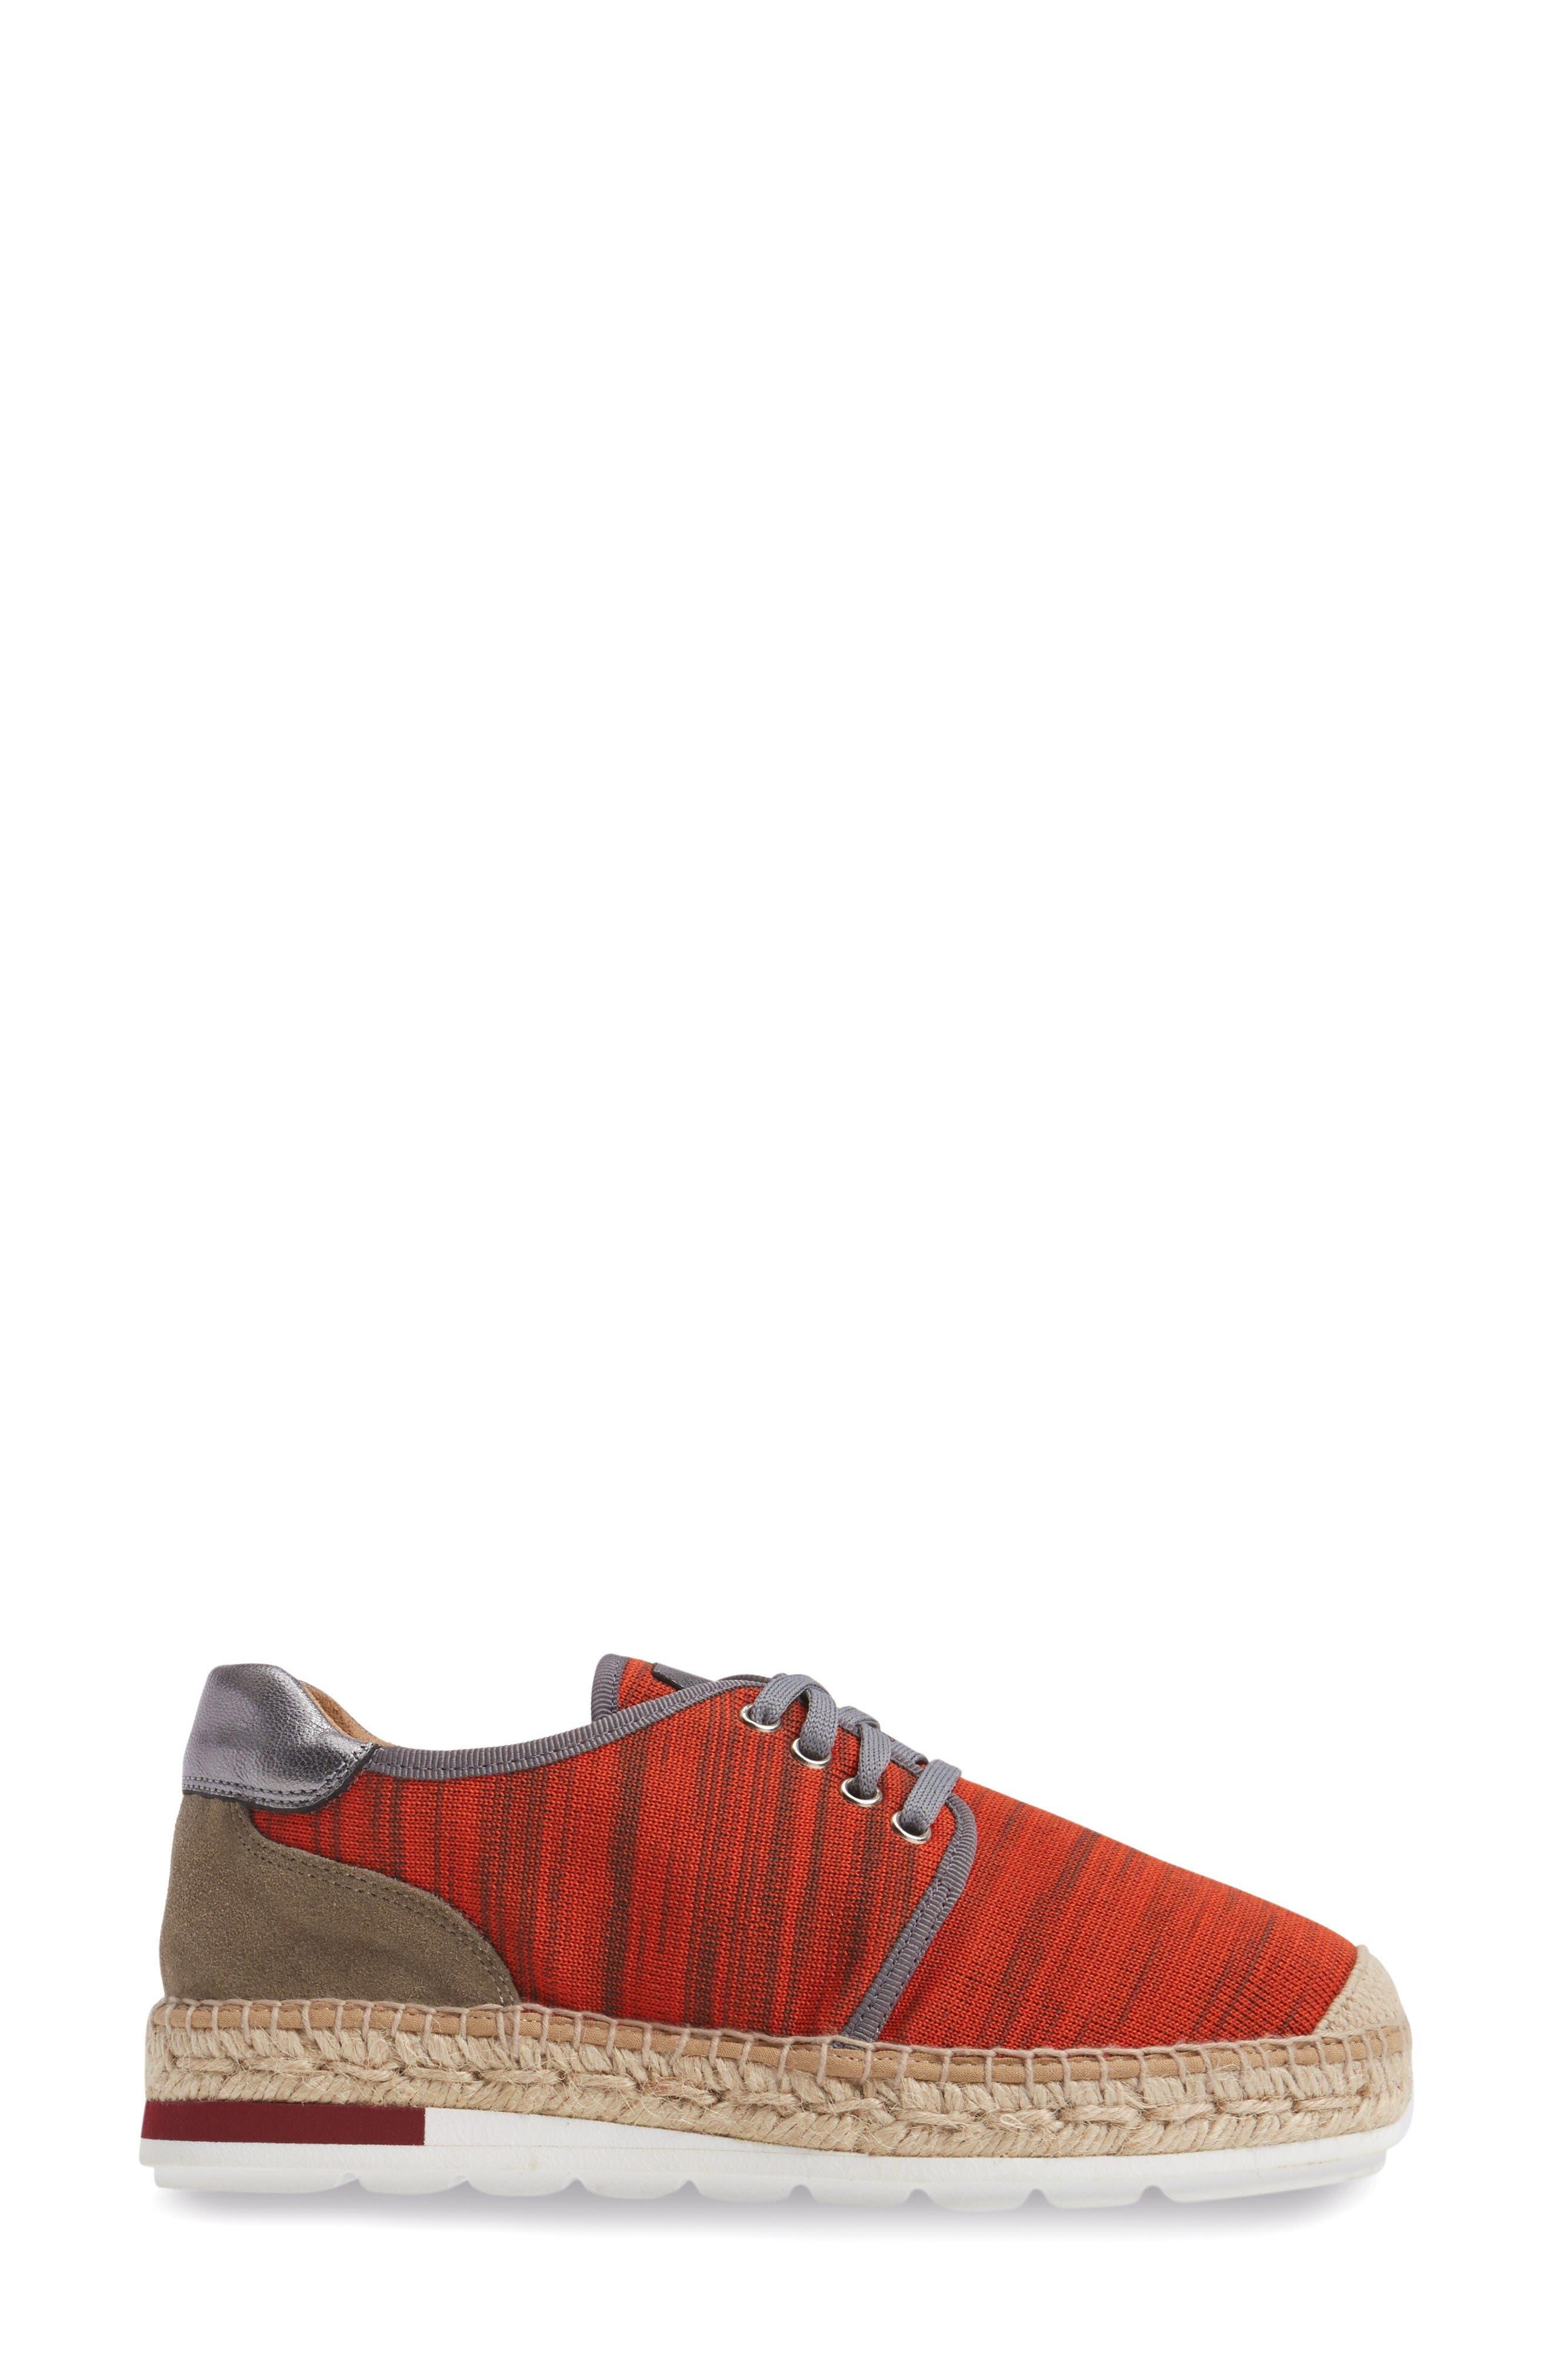 Alternate Image 3  - Bettye Muller Newport Mesh Espadrille Sneaker (Women)